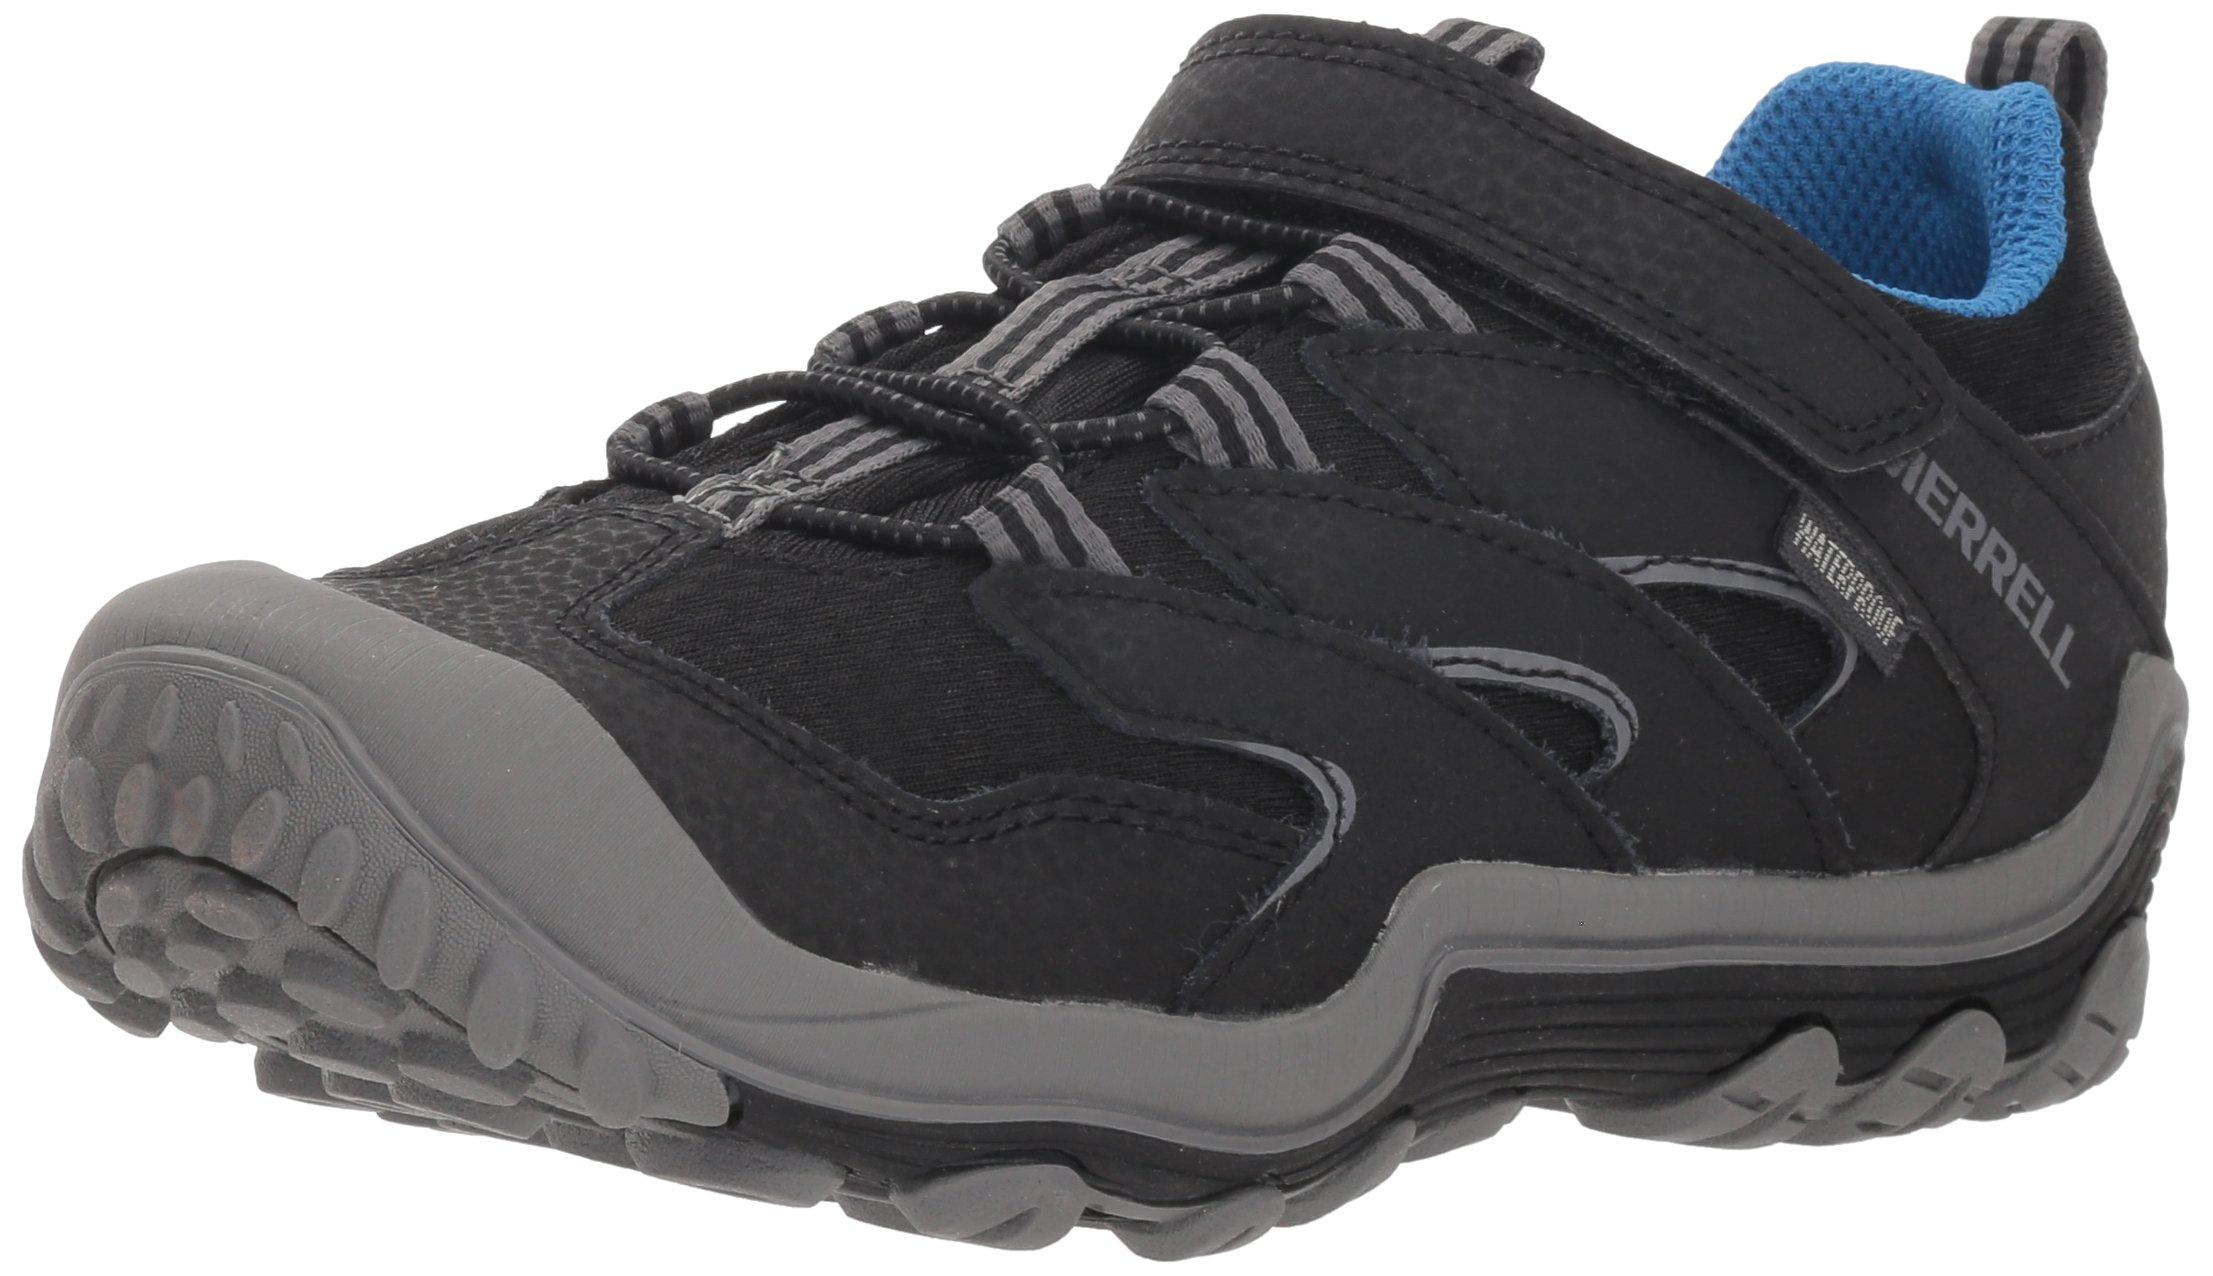 aaac8b5f23326 Merrell Boys' Chameleon 7 Access Low A/C WTRPF Hiking Shoe, Black, 3 Wide  US Little Kid